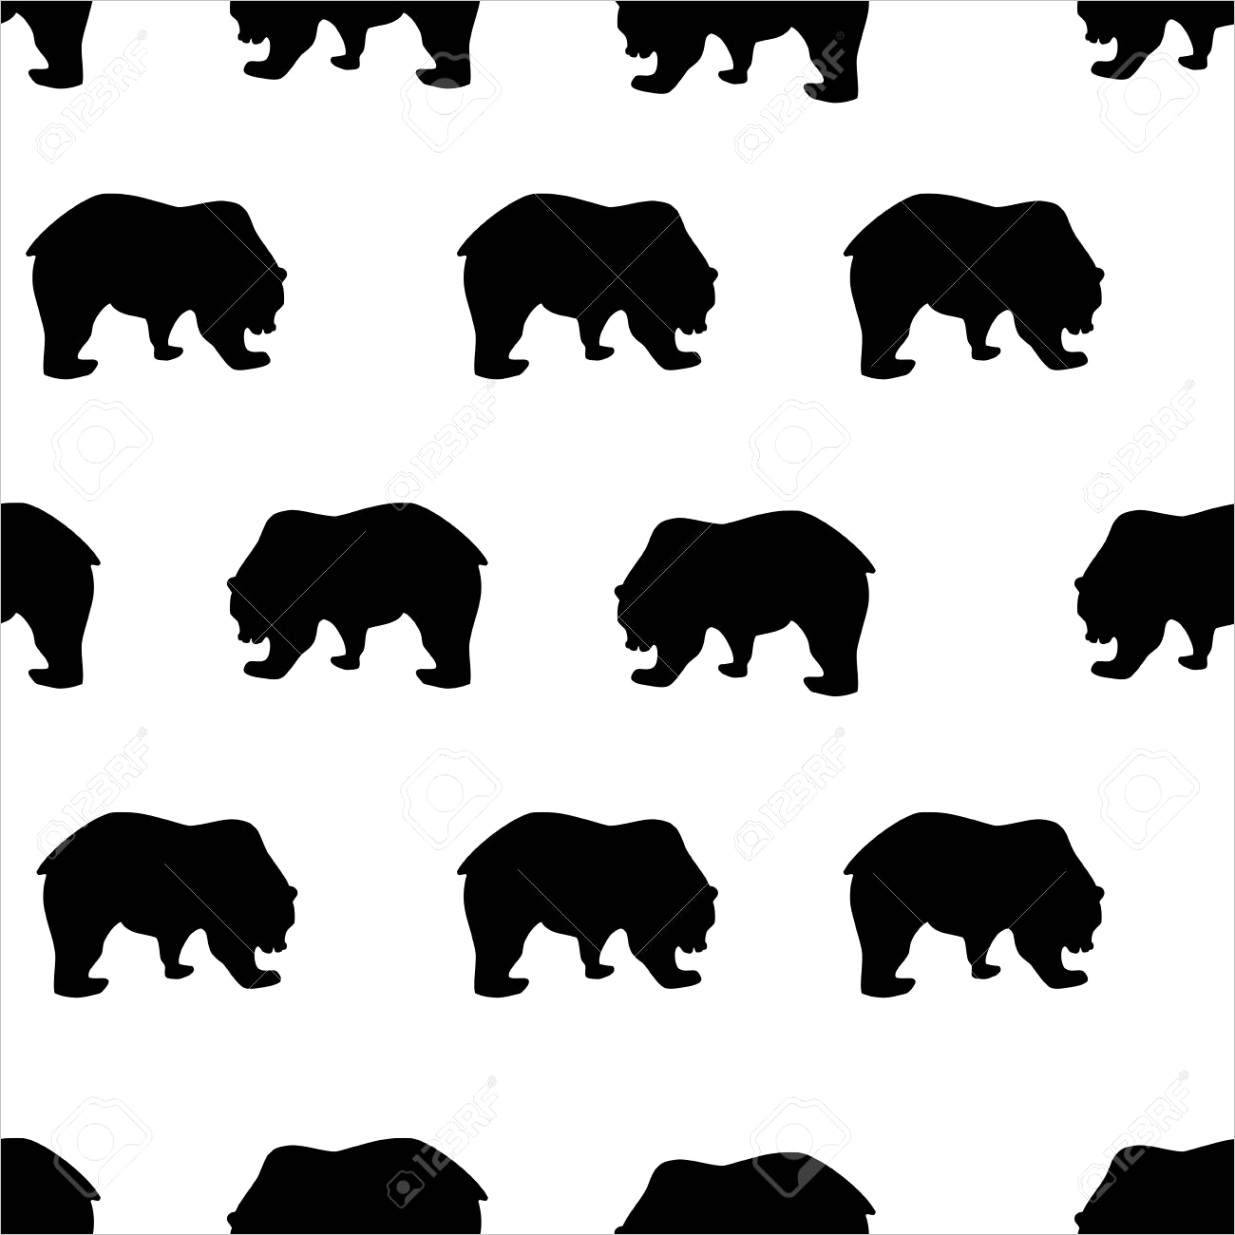 photo stock vector seamless pattern black bear silhouette on white background vintage style wild animals simple cute ki